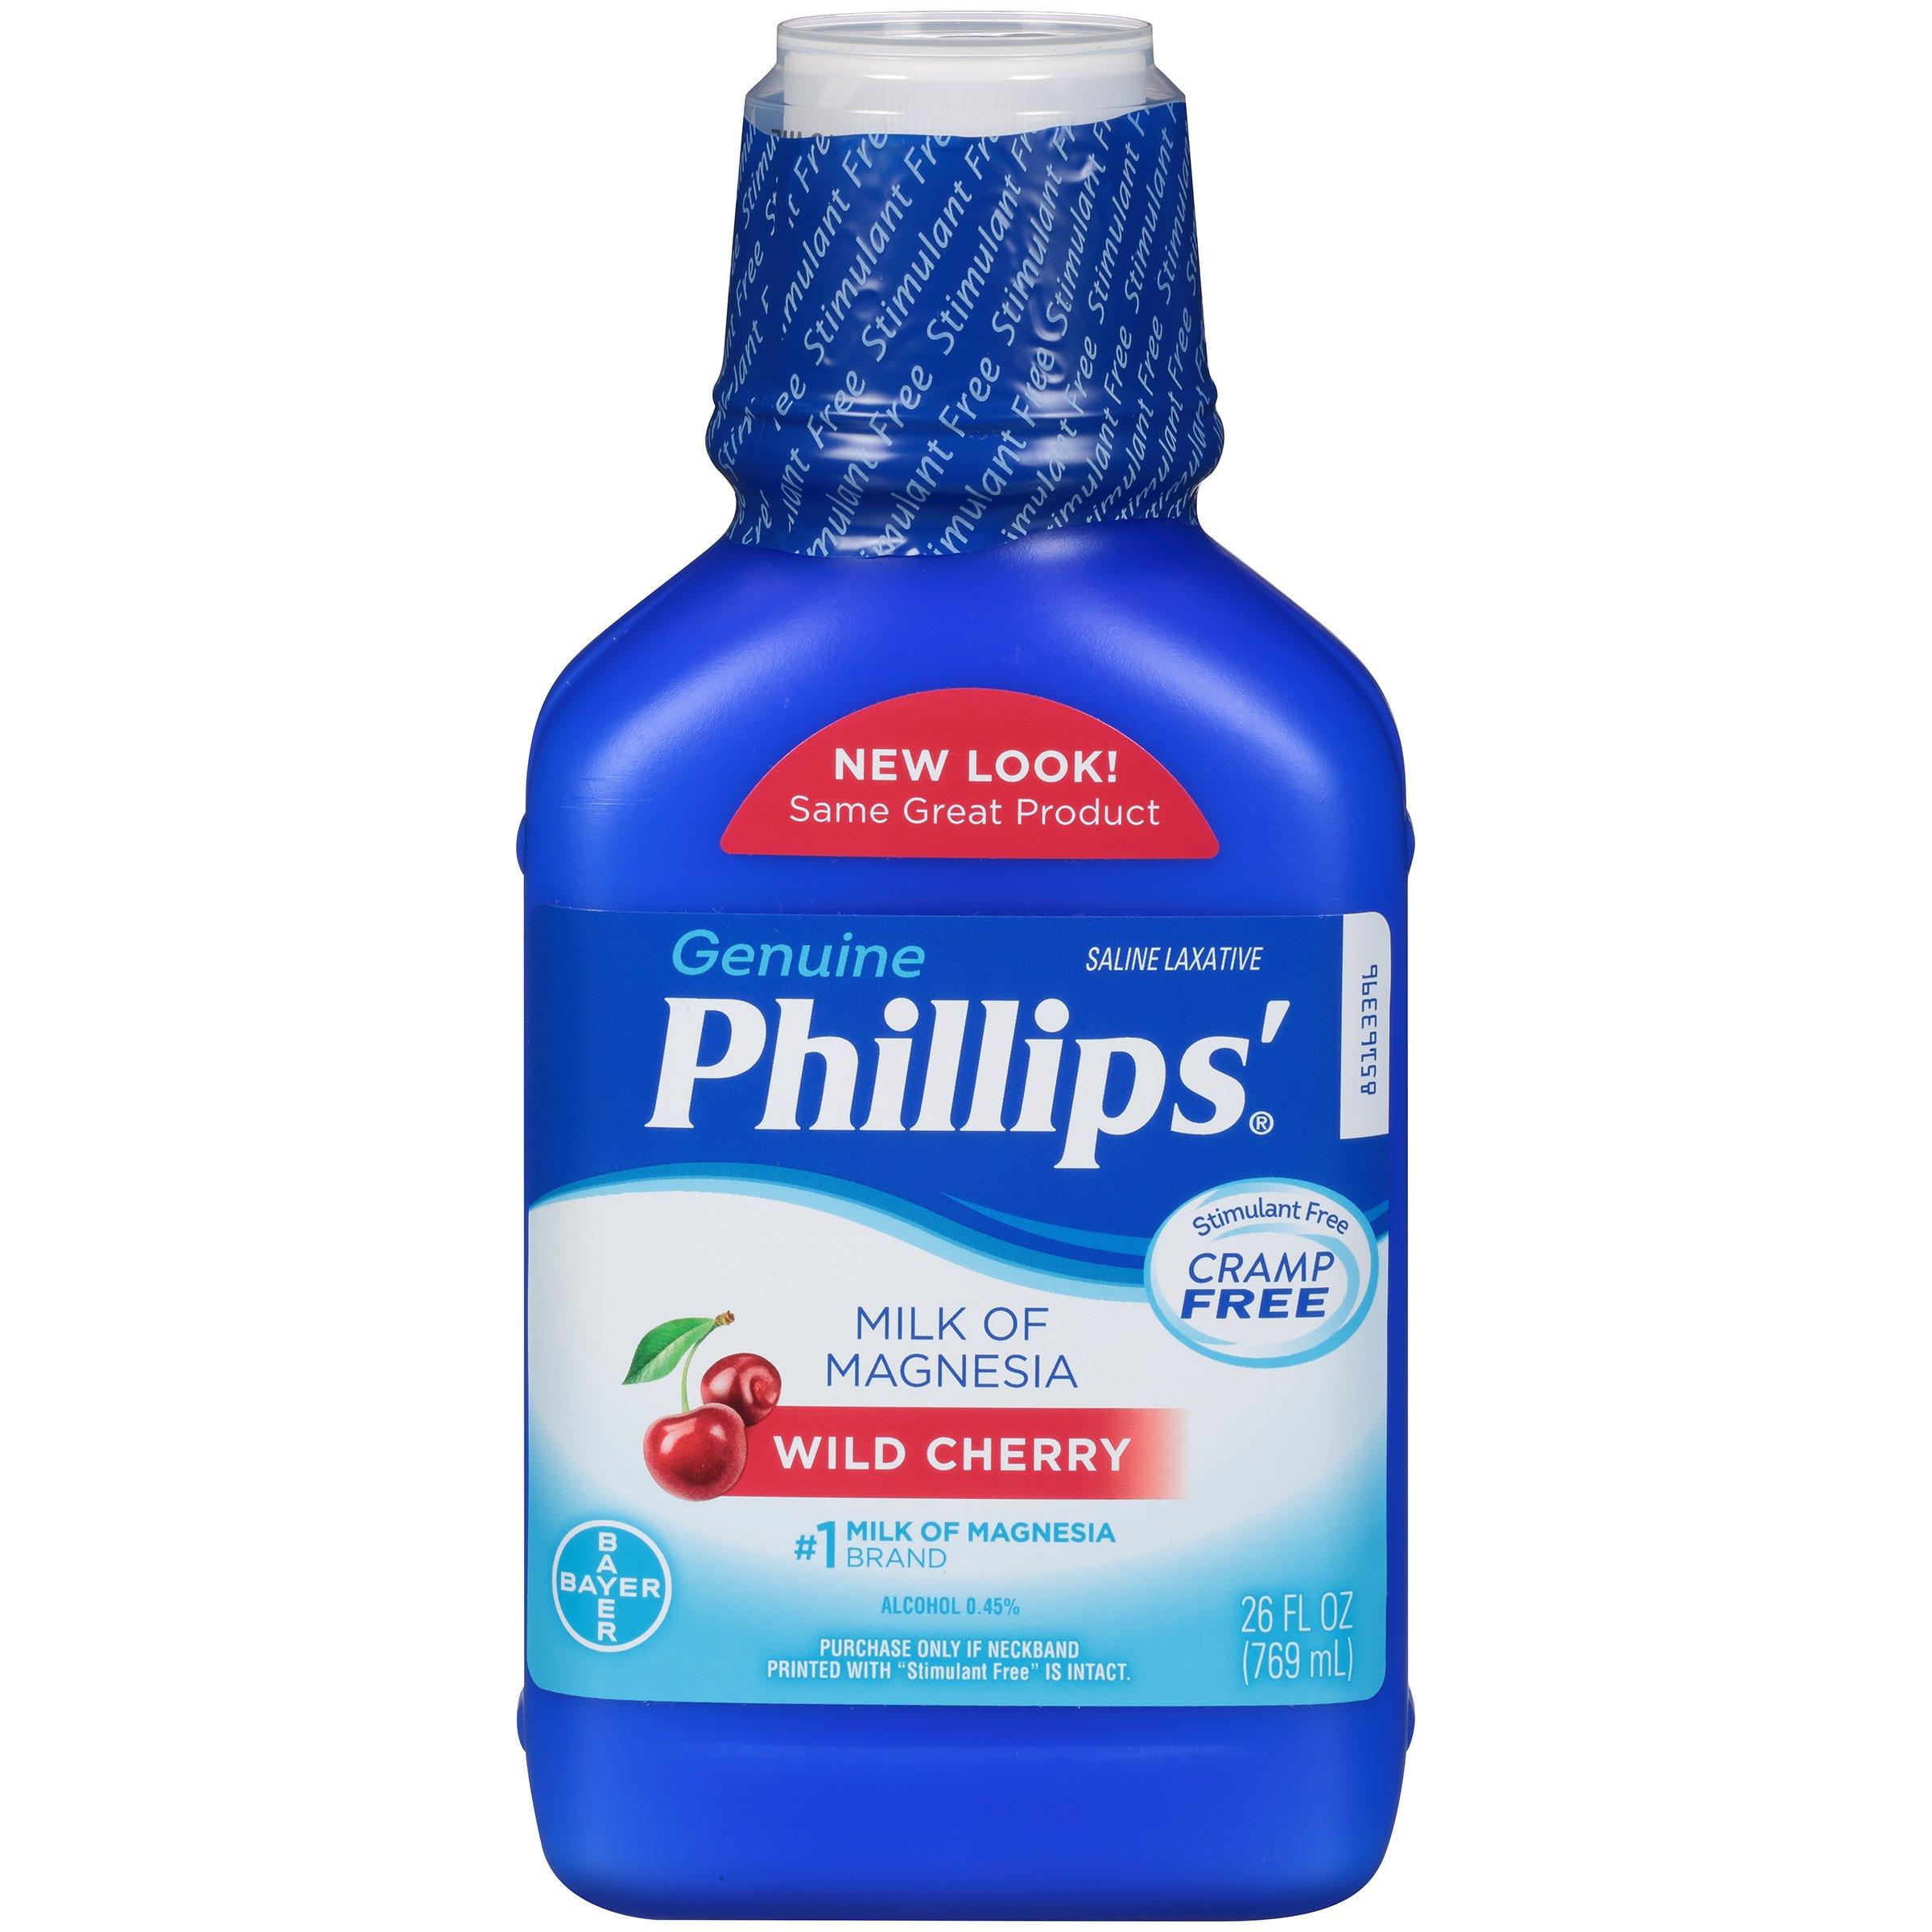 Phillips Milk of Magnesia Laxative (Wild Cherry, 26-Fluid-Ounce Bottle